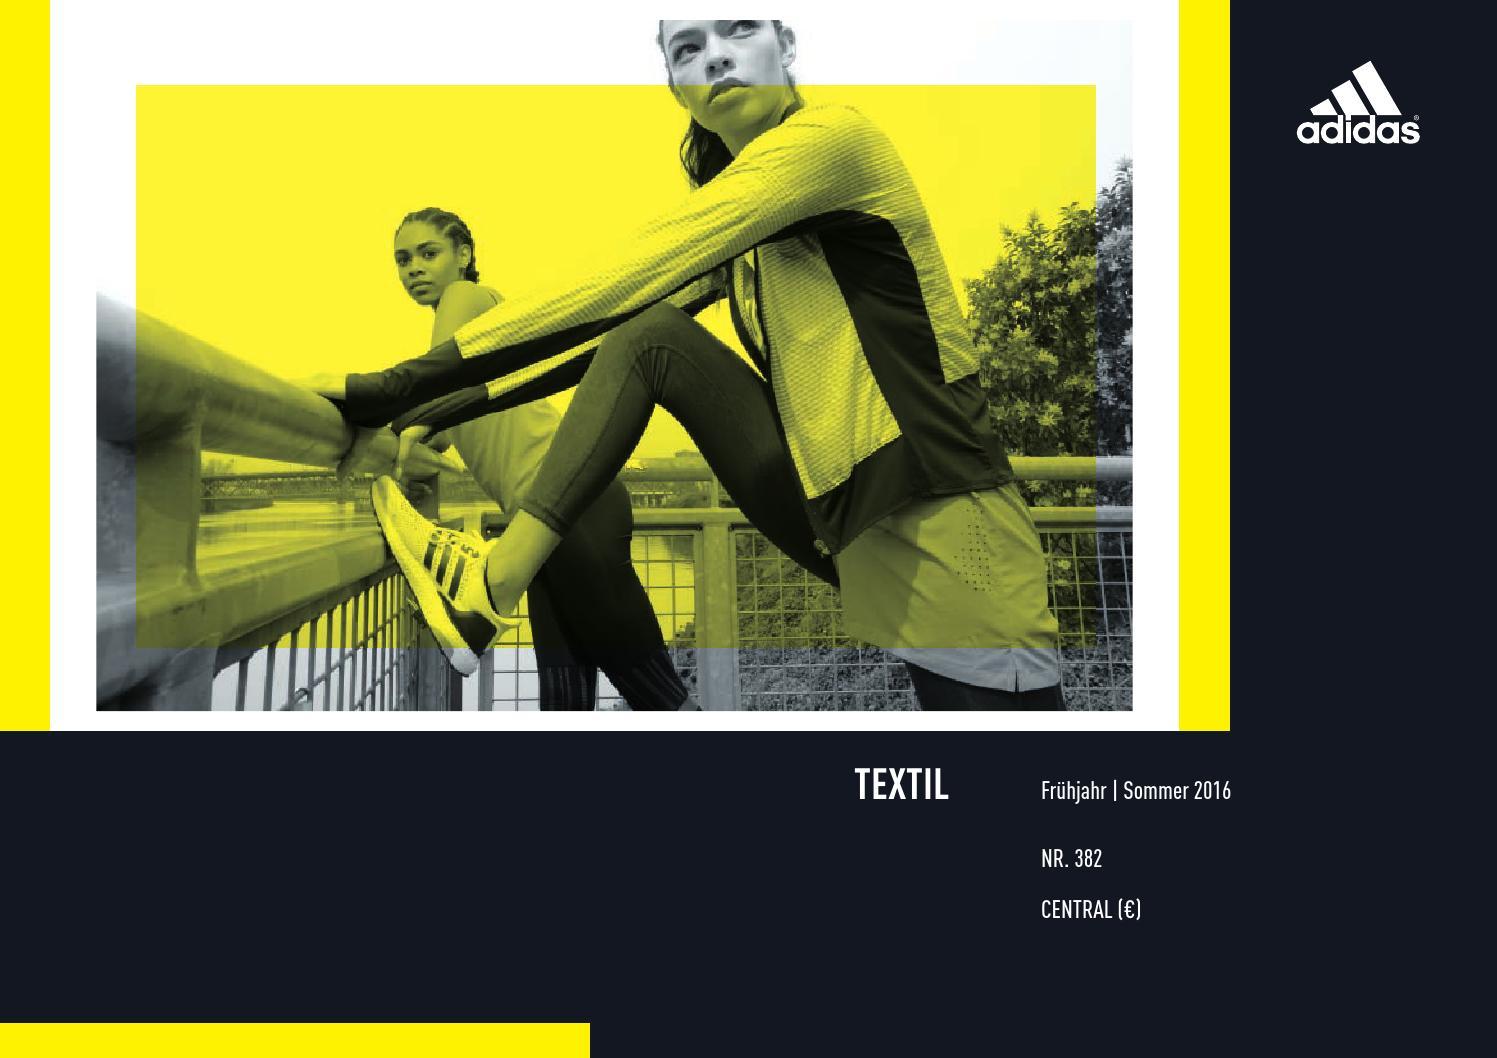 16q1 382 textil eur by Euroteamsport Vilshofen issuu